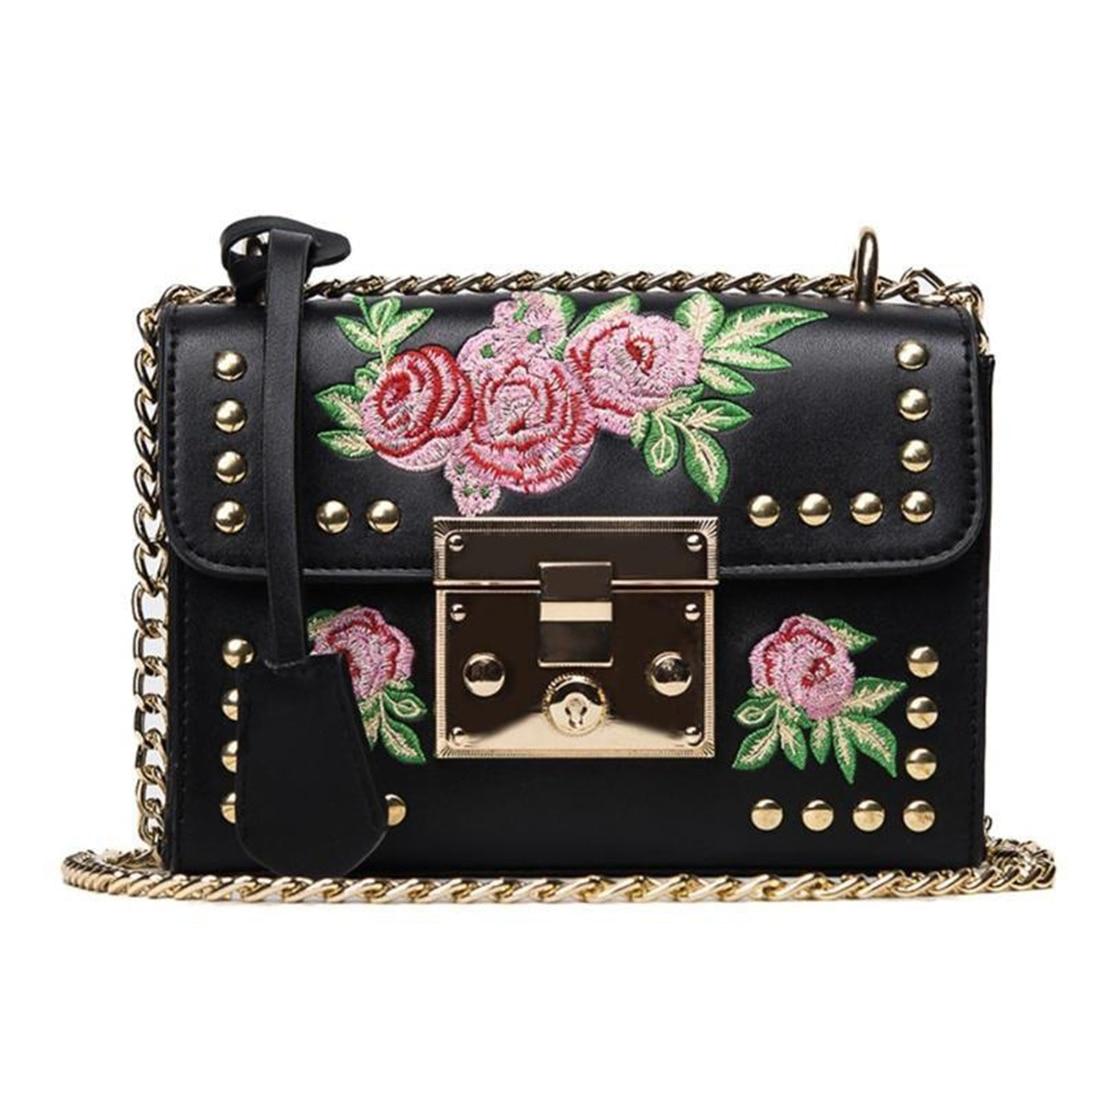 AFBC Black new PU leather handbag Messenger bag embroidery rivets lock embroidery chain bag tide national wind small square ba